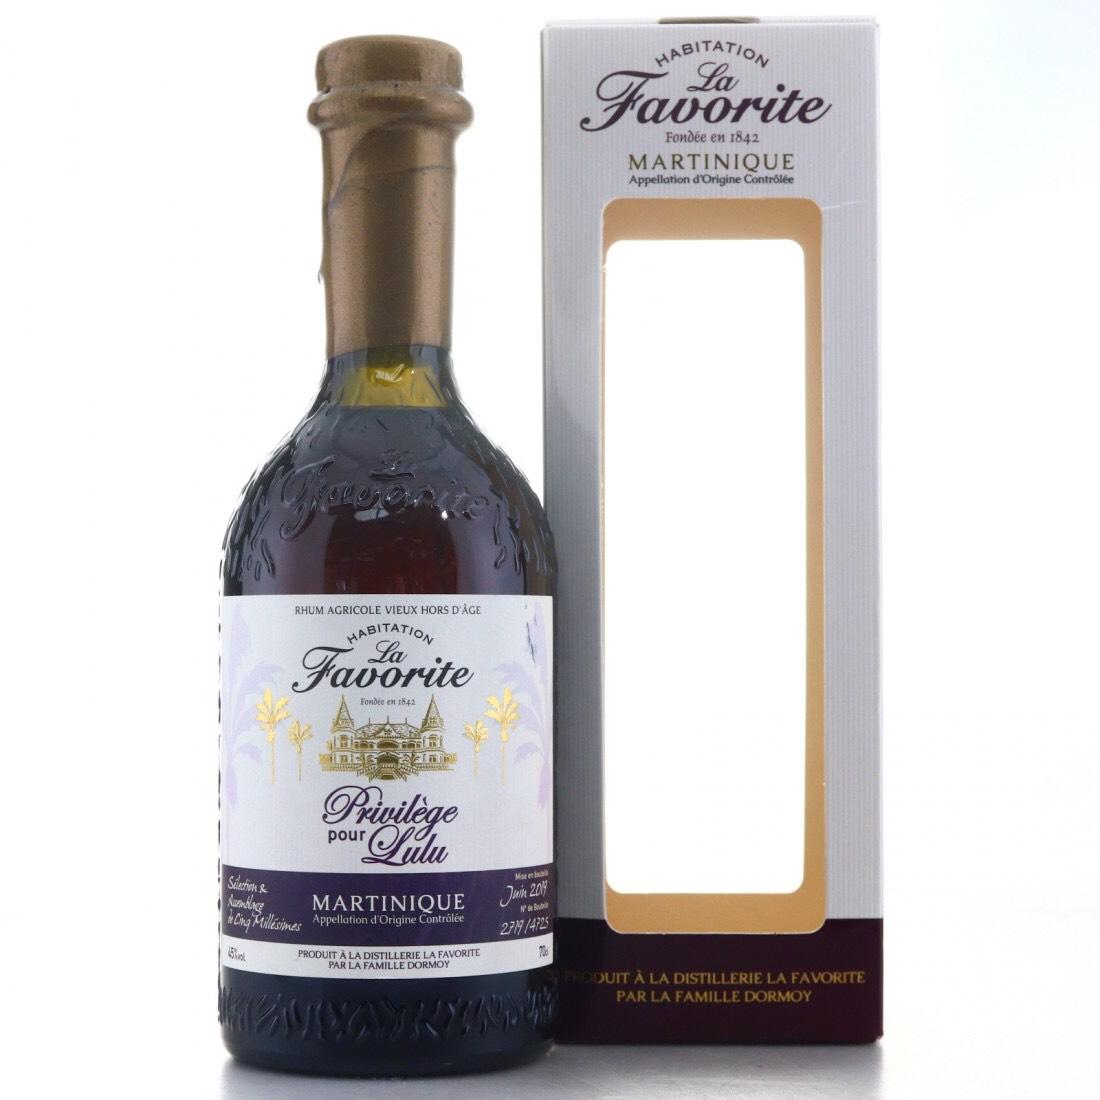 Bottle image of Cuvée Privilège Pour Lulu